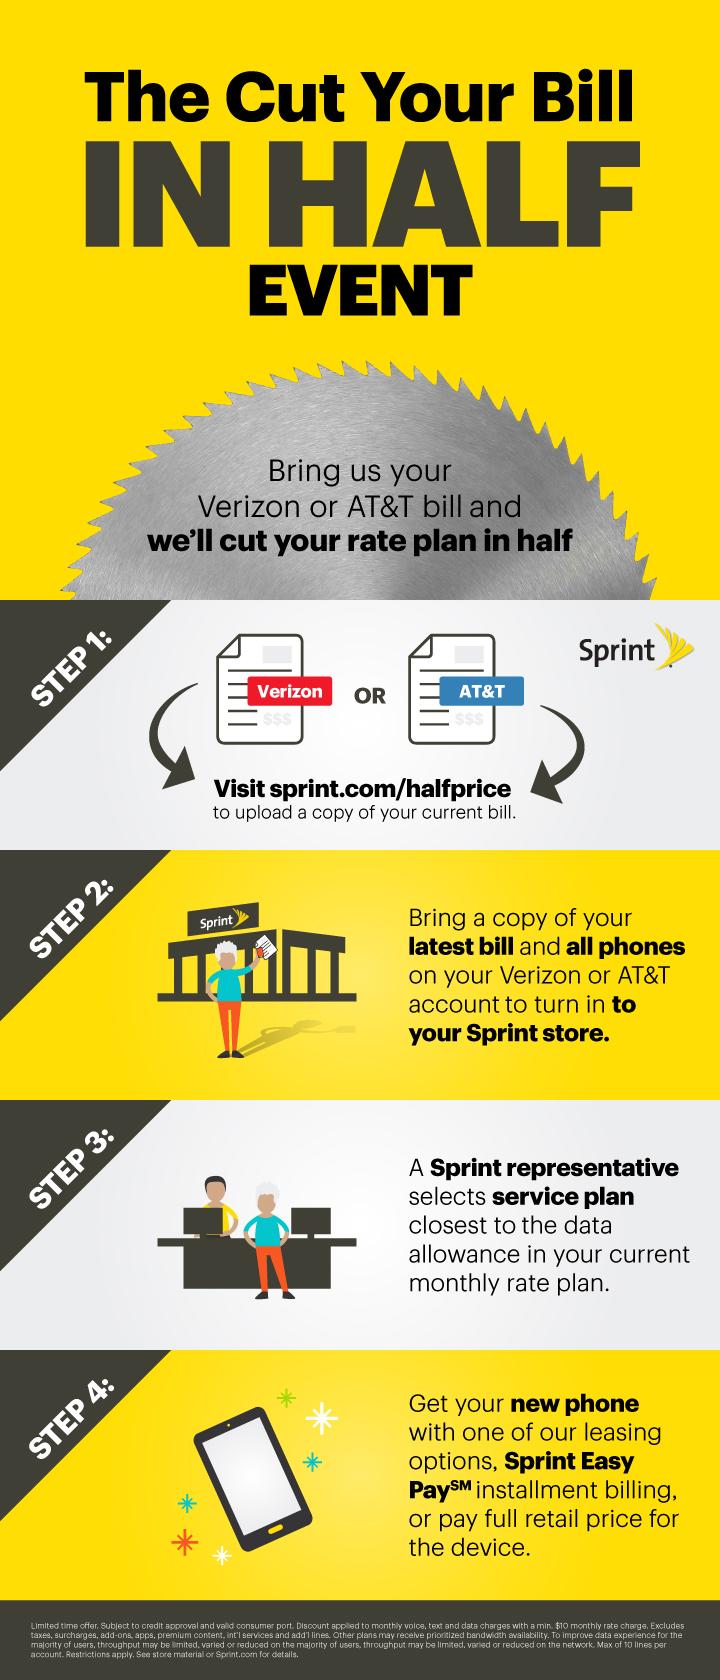 Sprint_Cut-Bill-in-Half_FINAL